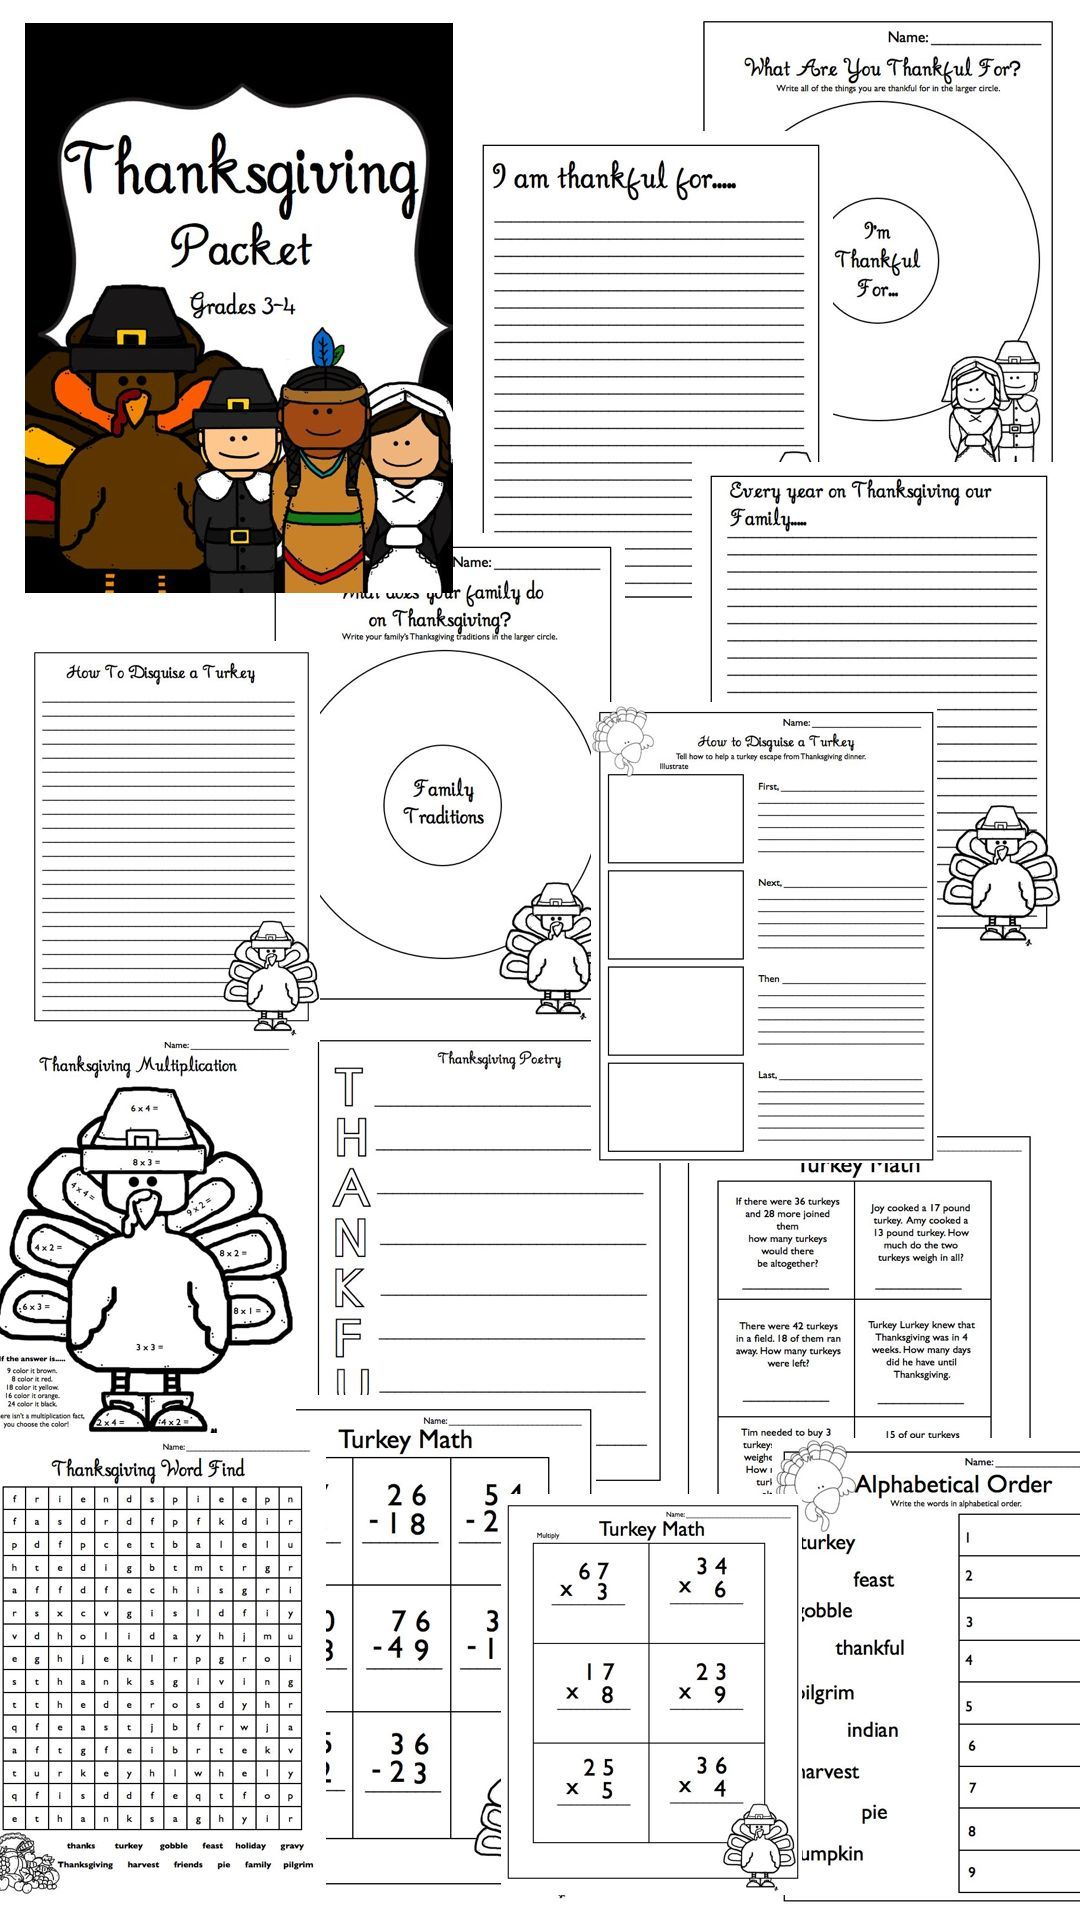 hight resolution of Thanksgiving Packet Grades 3-4 ELA \u0026 Math   Thanksgiving classroom  activities